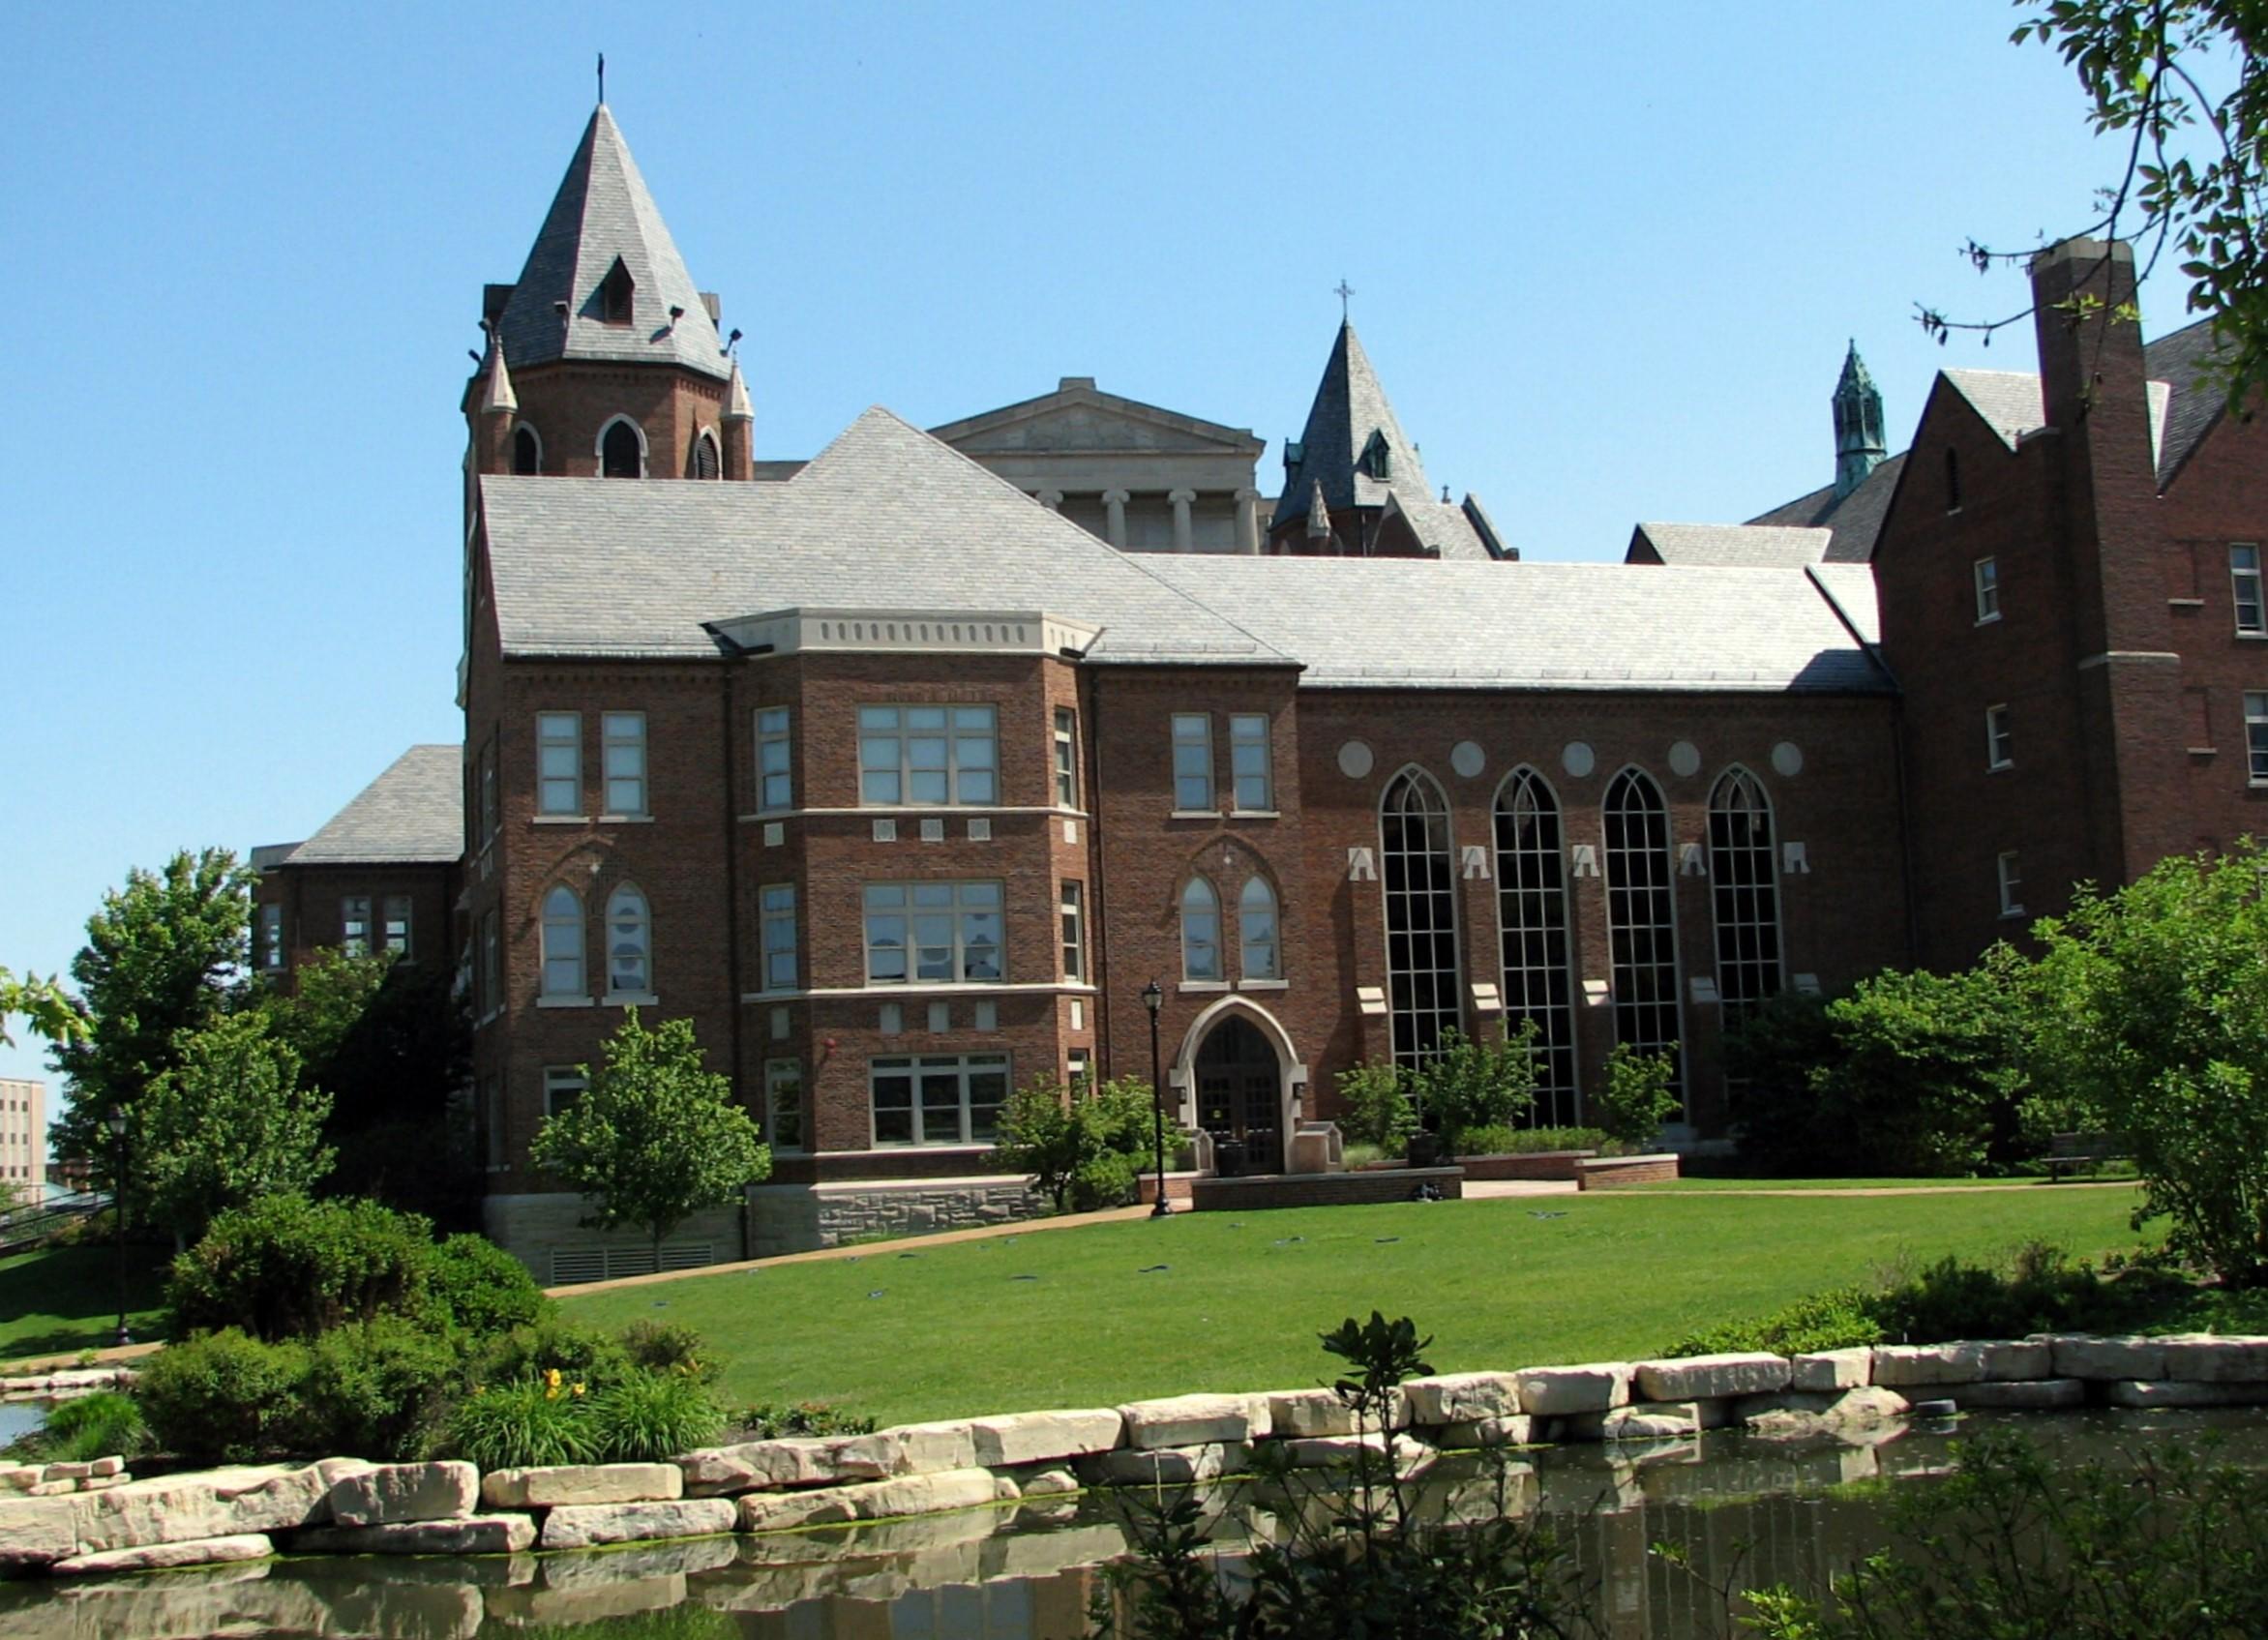 John Cook School of Business - Wikipedia